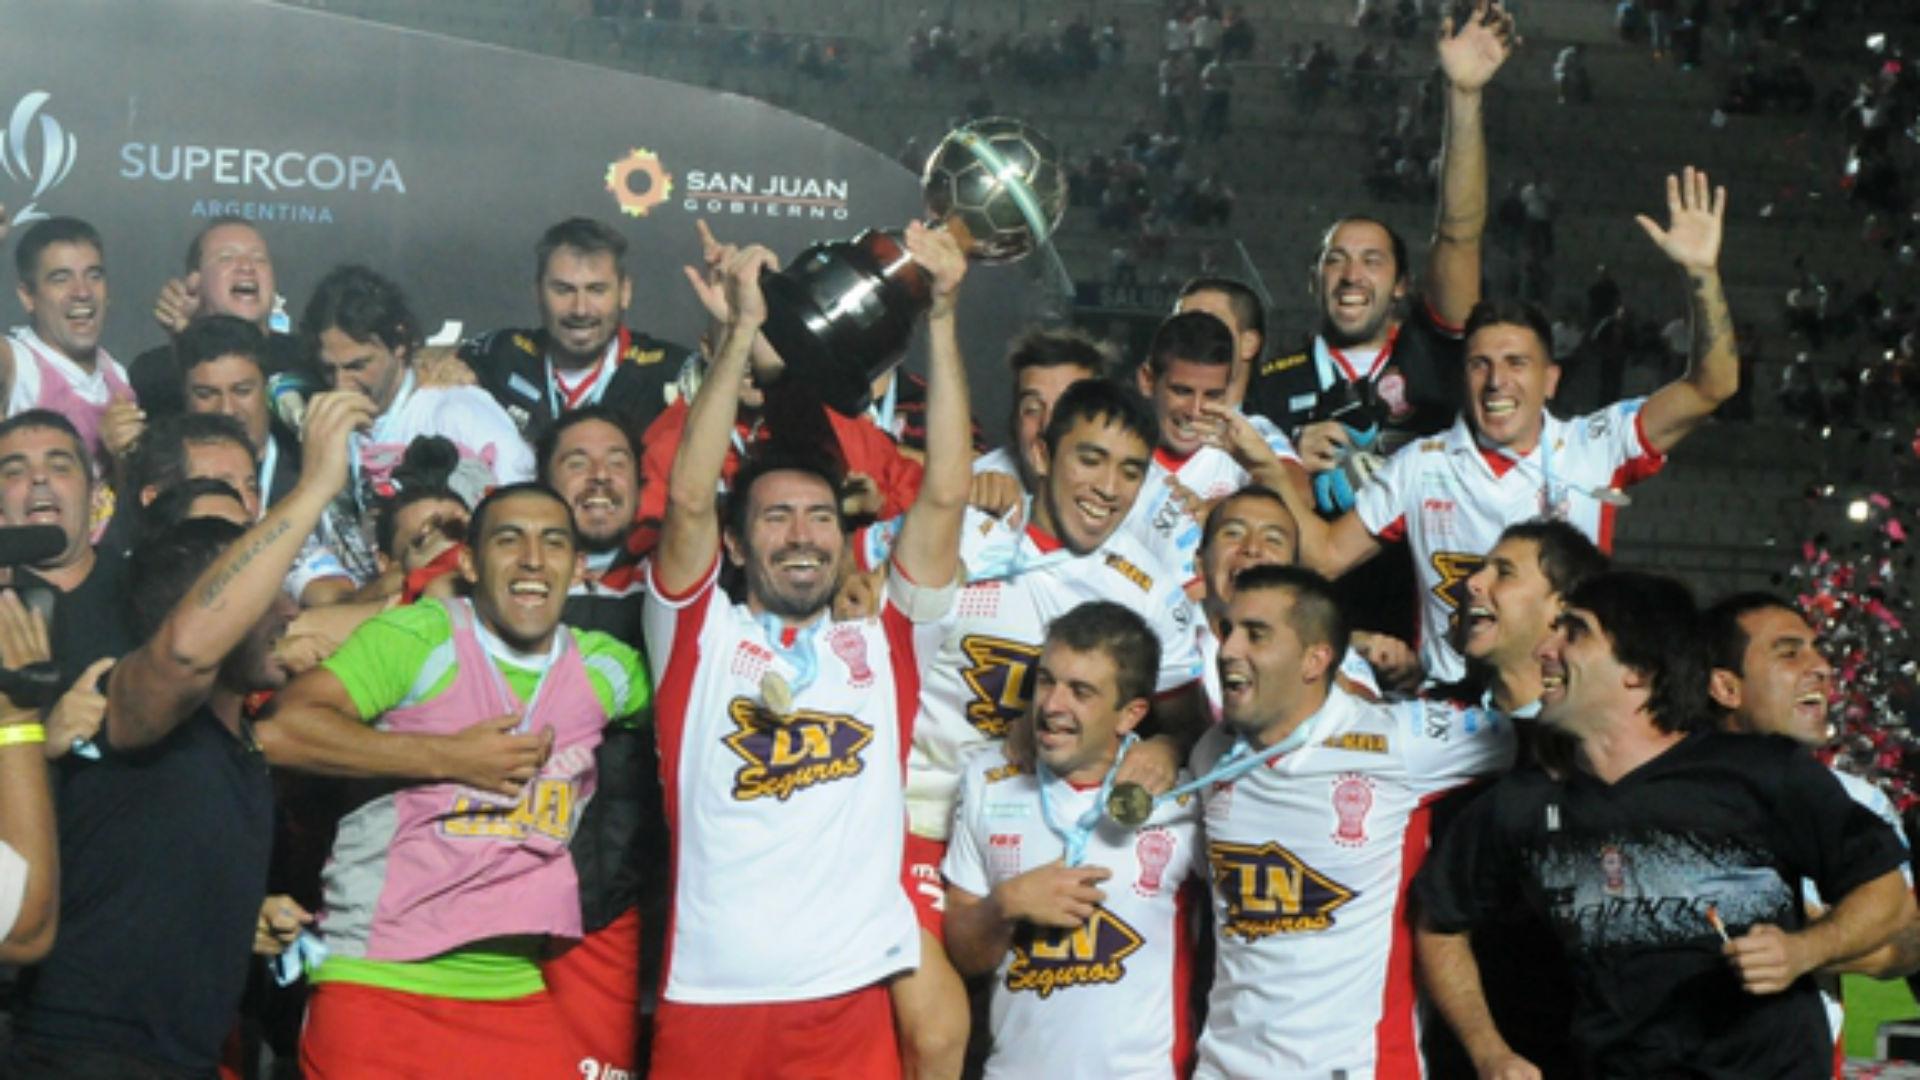 Huracan Supercopa Argentina 2014